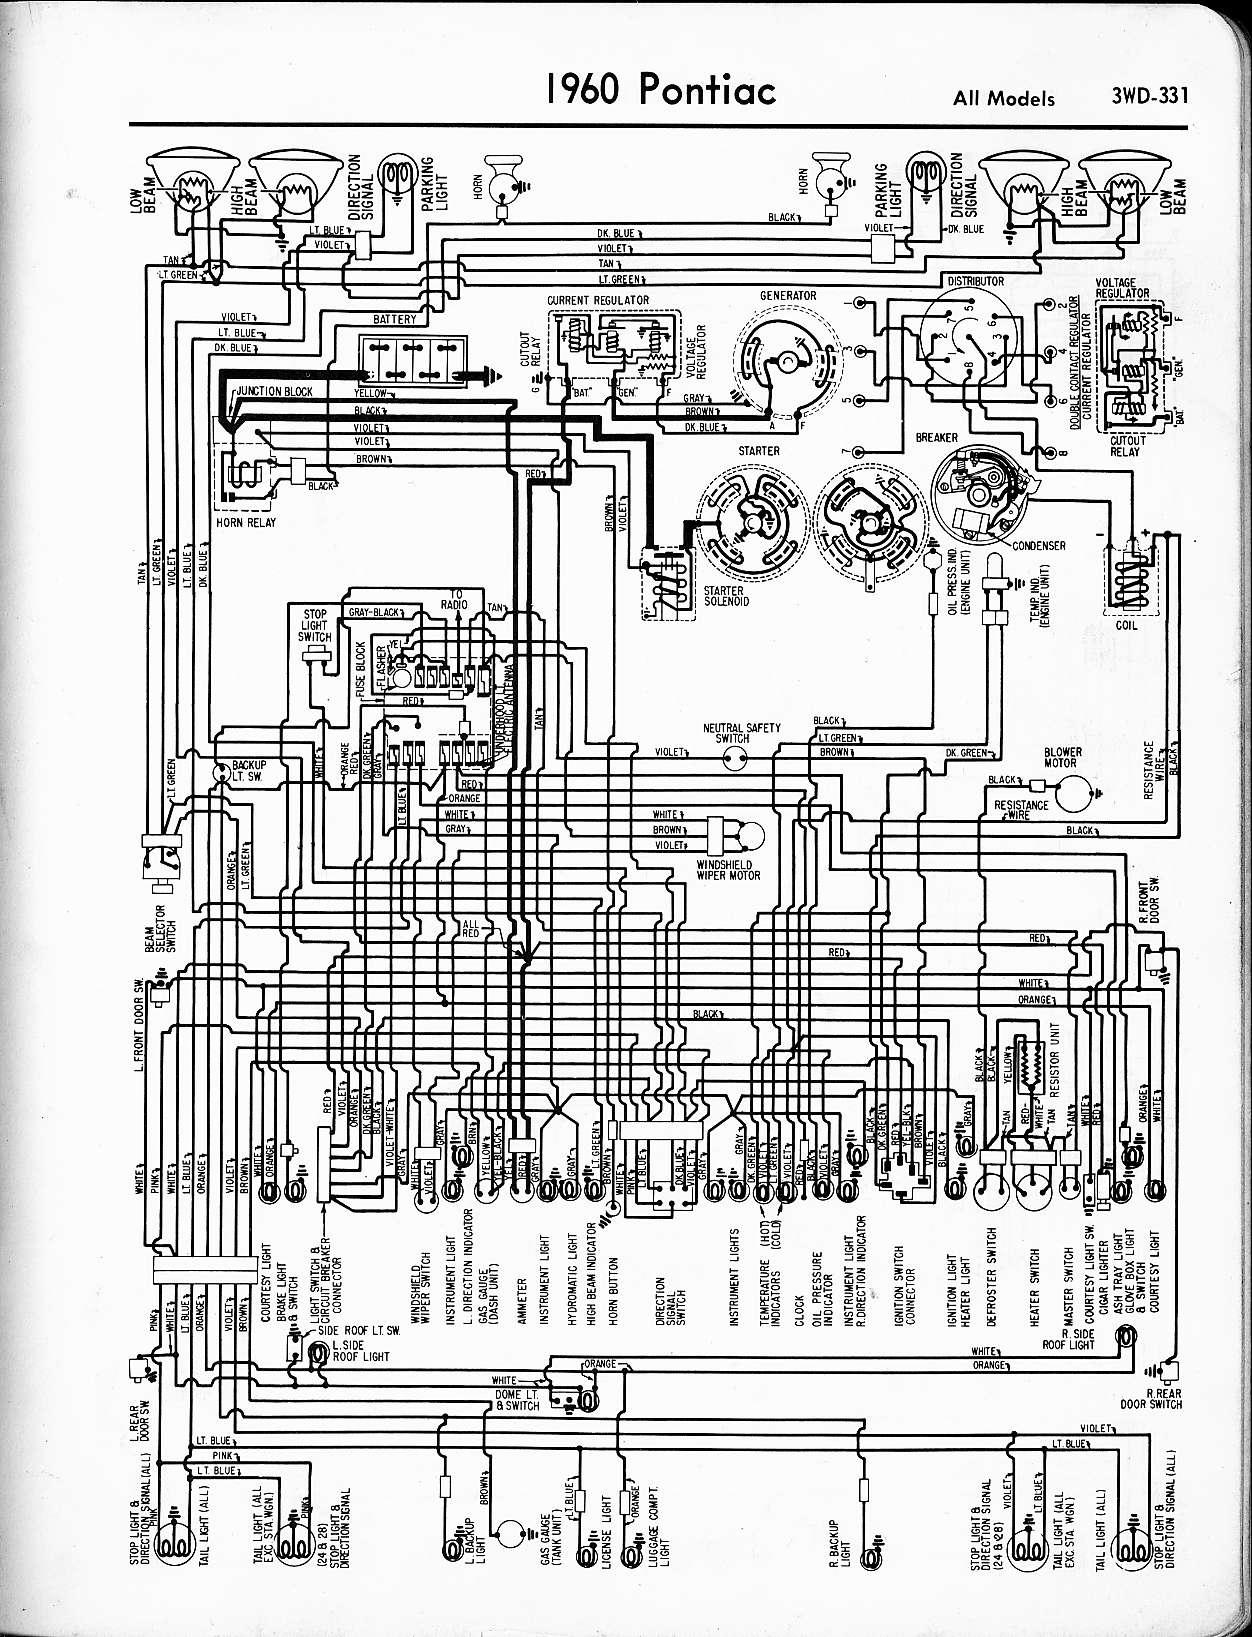 Marvelous 1966 Dodge Charger Wiring Diagram Basic Electronics Wiring Diagram Wiring Cloud Photboapumohammedshrineorg